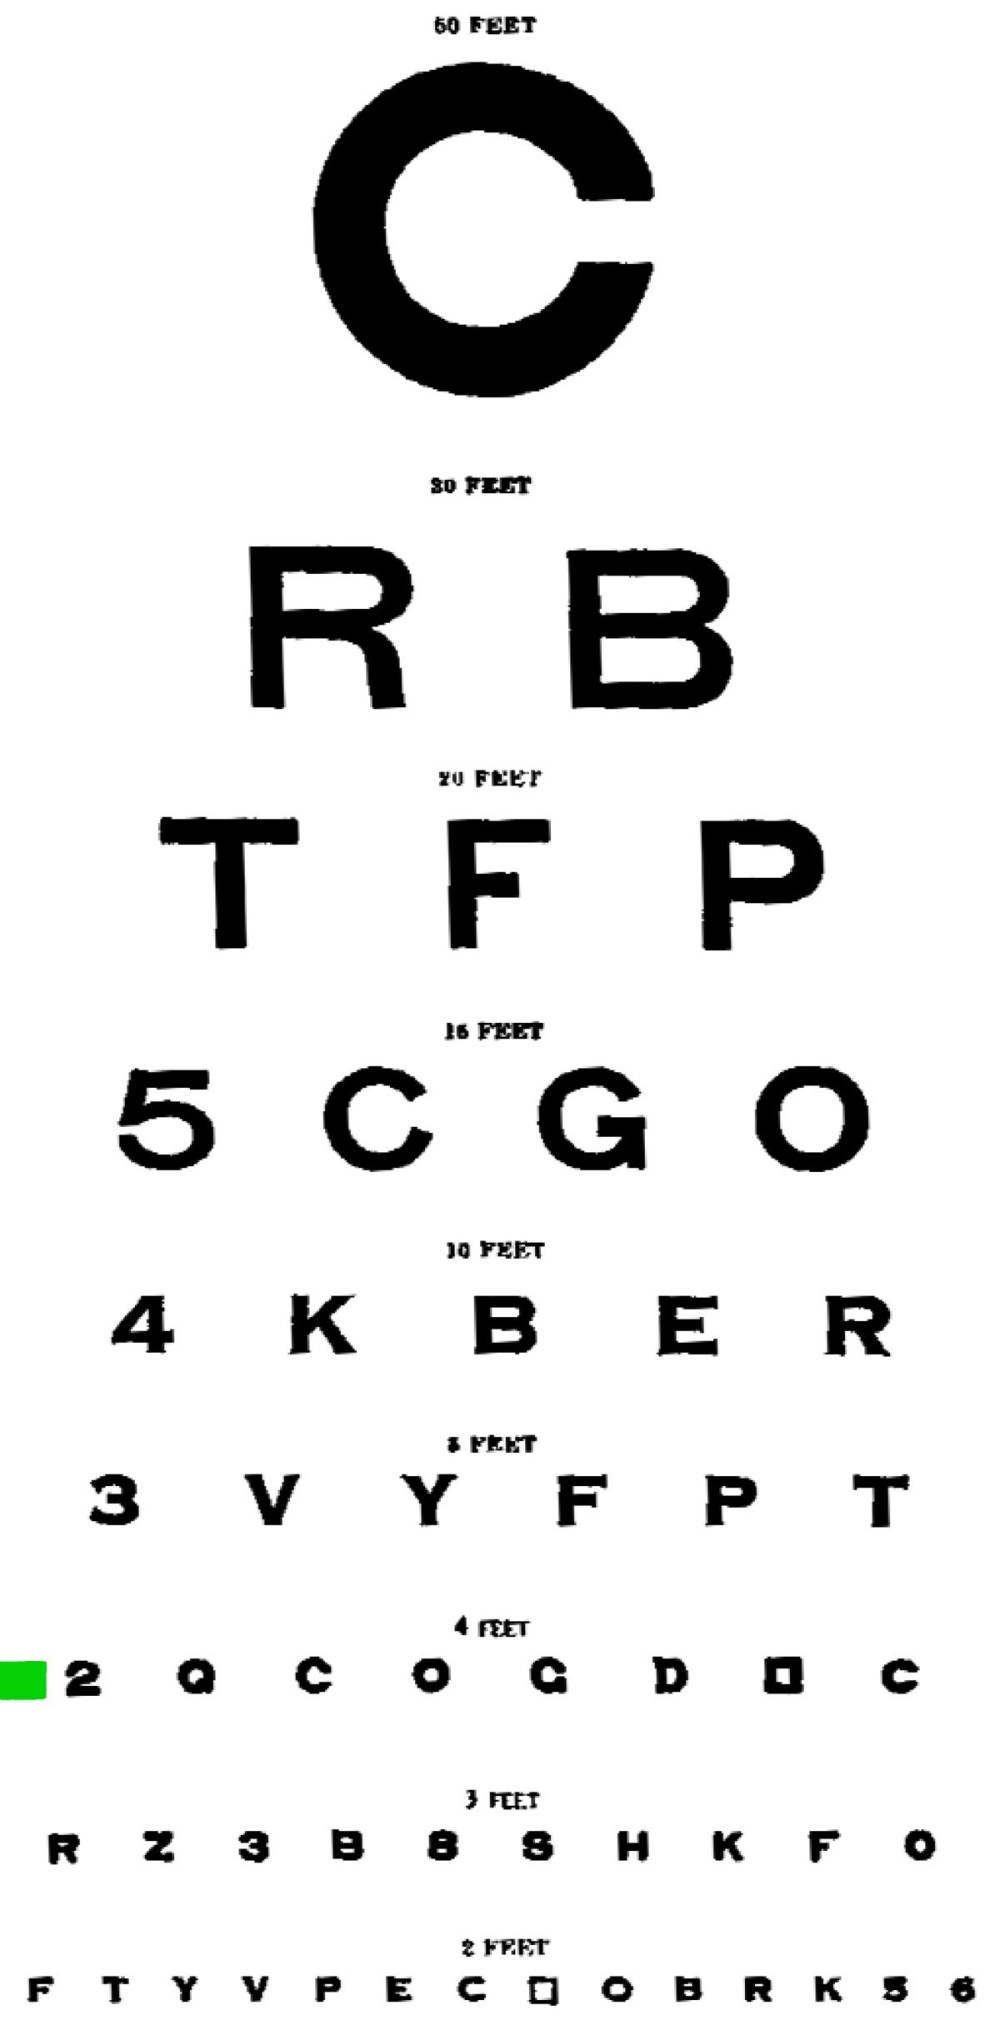 medium resolution of eye exam for diagrams easy wiring diagrams human eye model diagram eye chart diagram